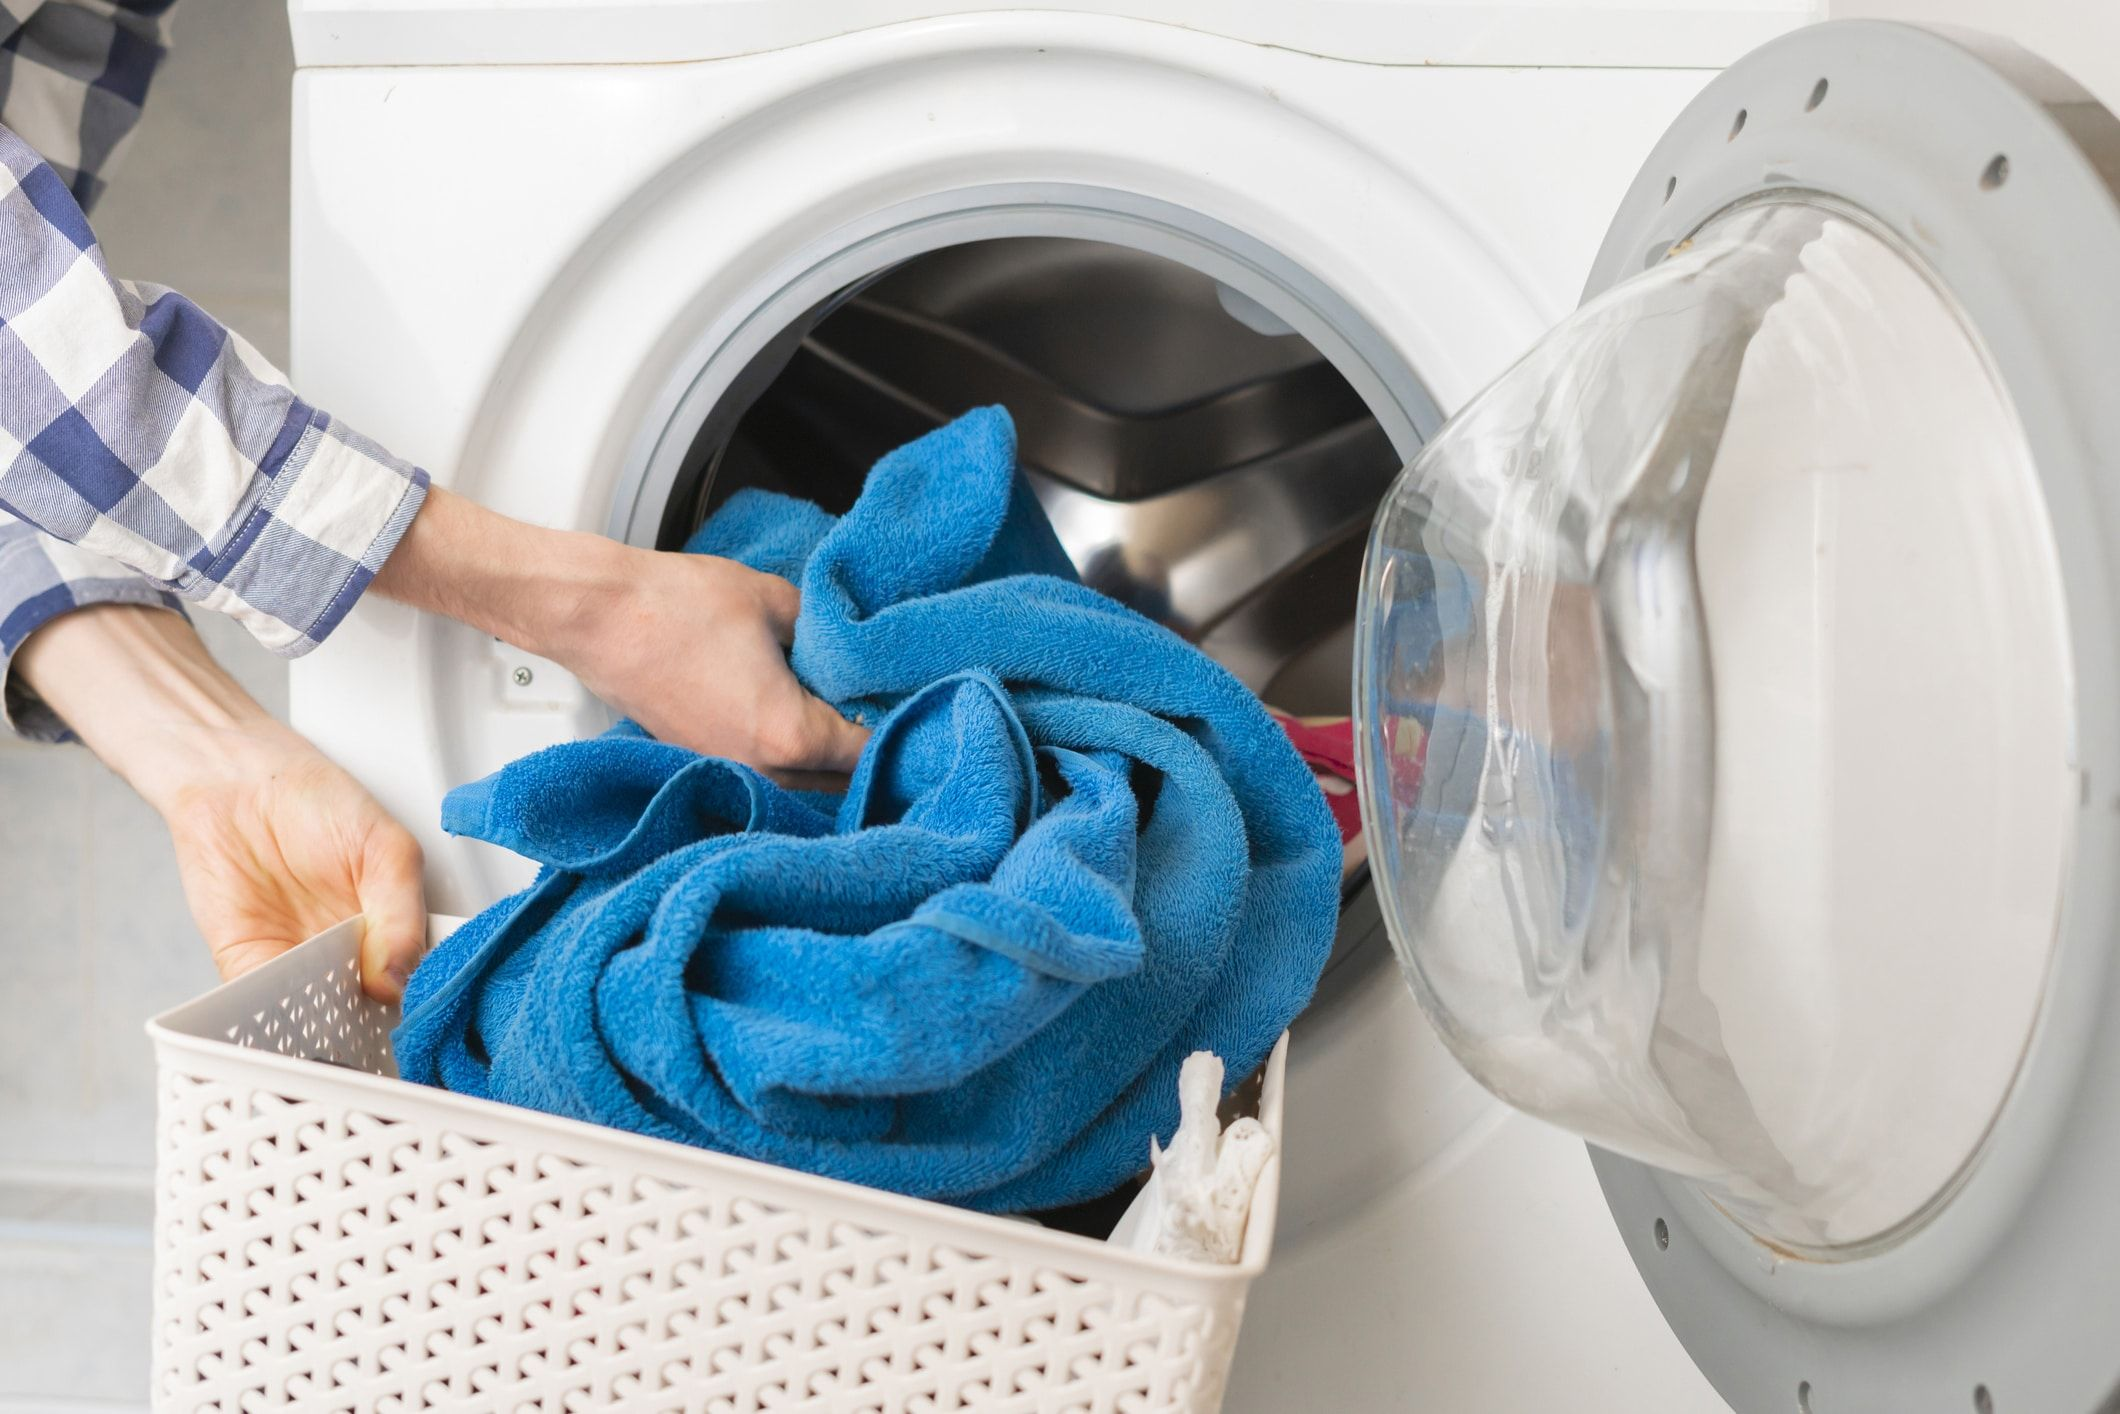 Laundry Bin Experiment Laundry Service Online Laundry Service